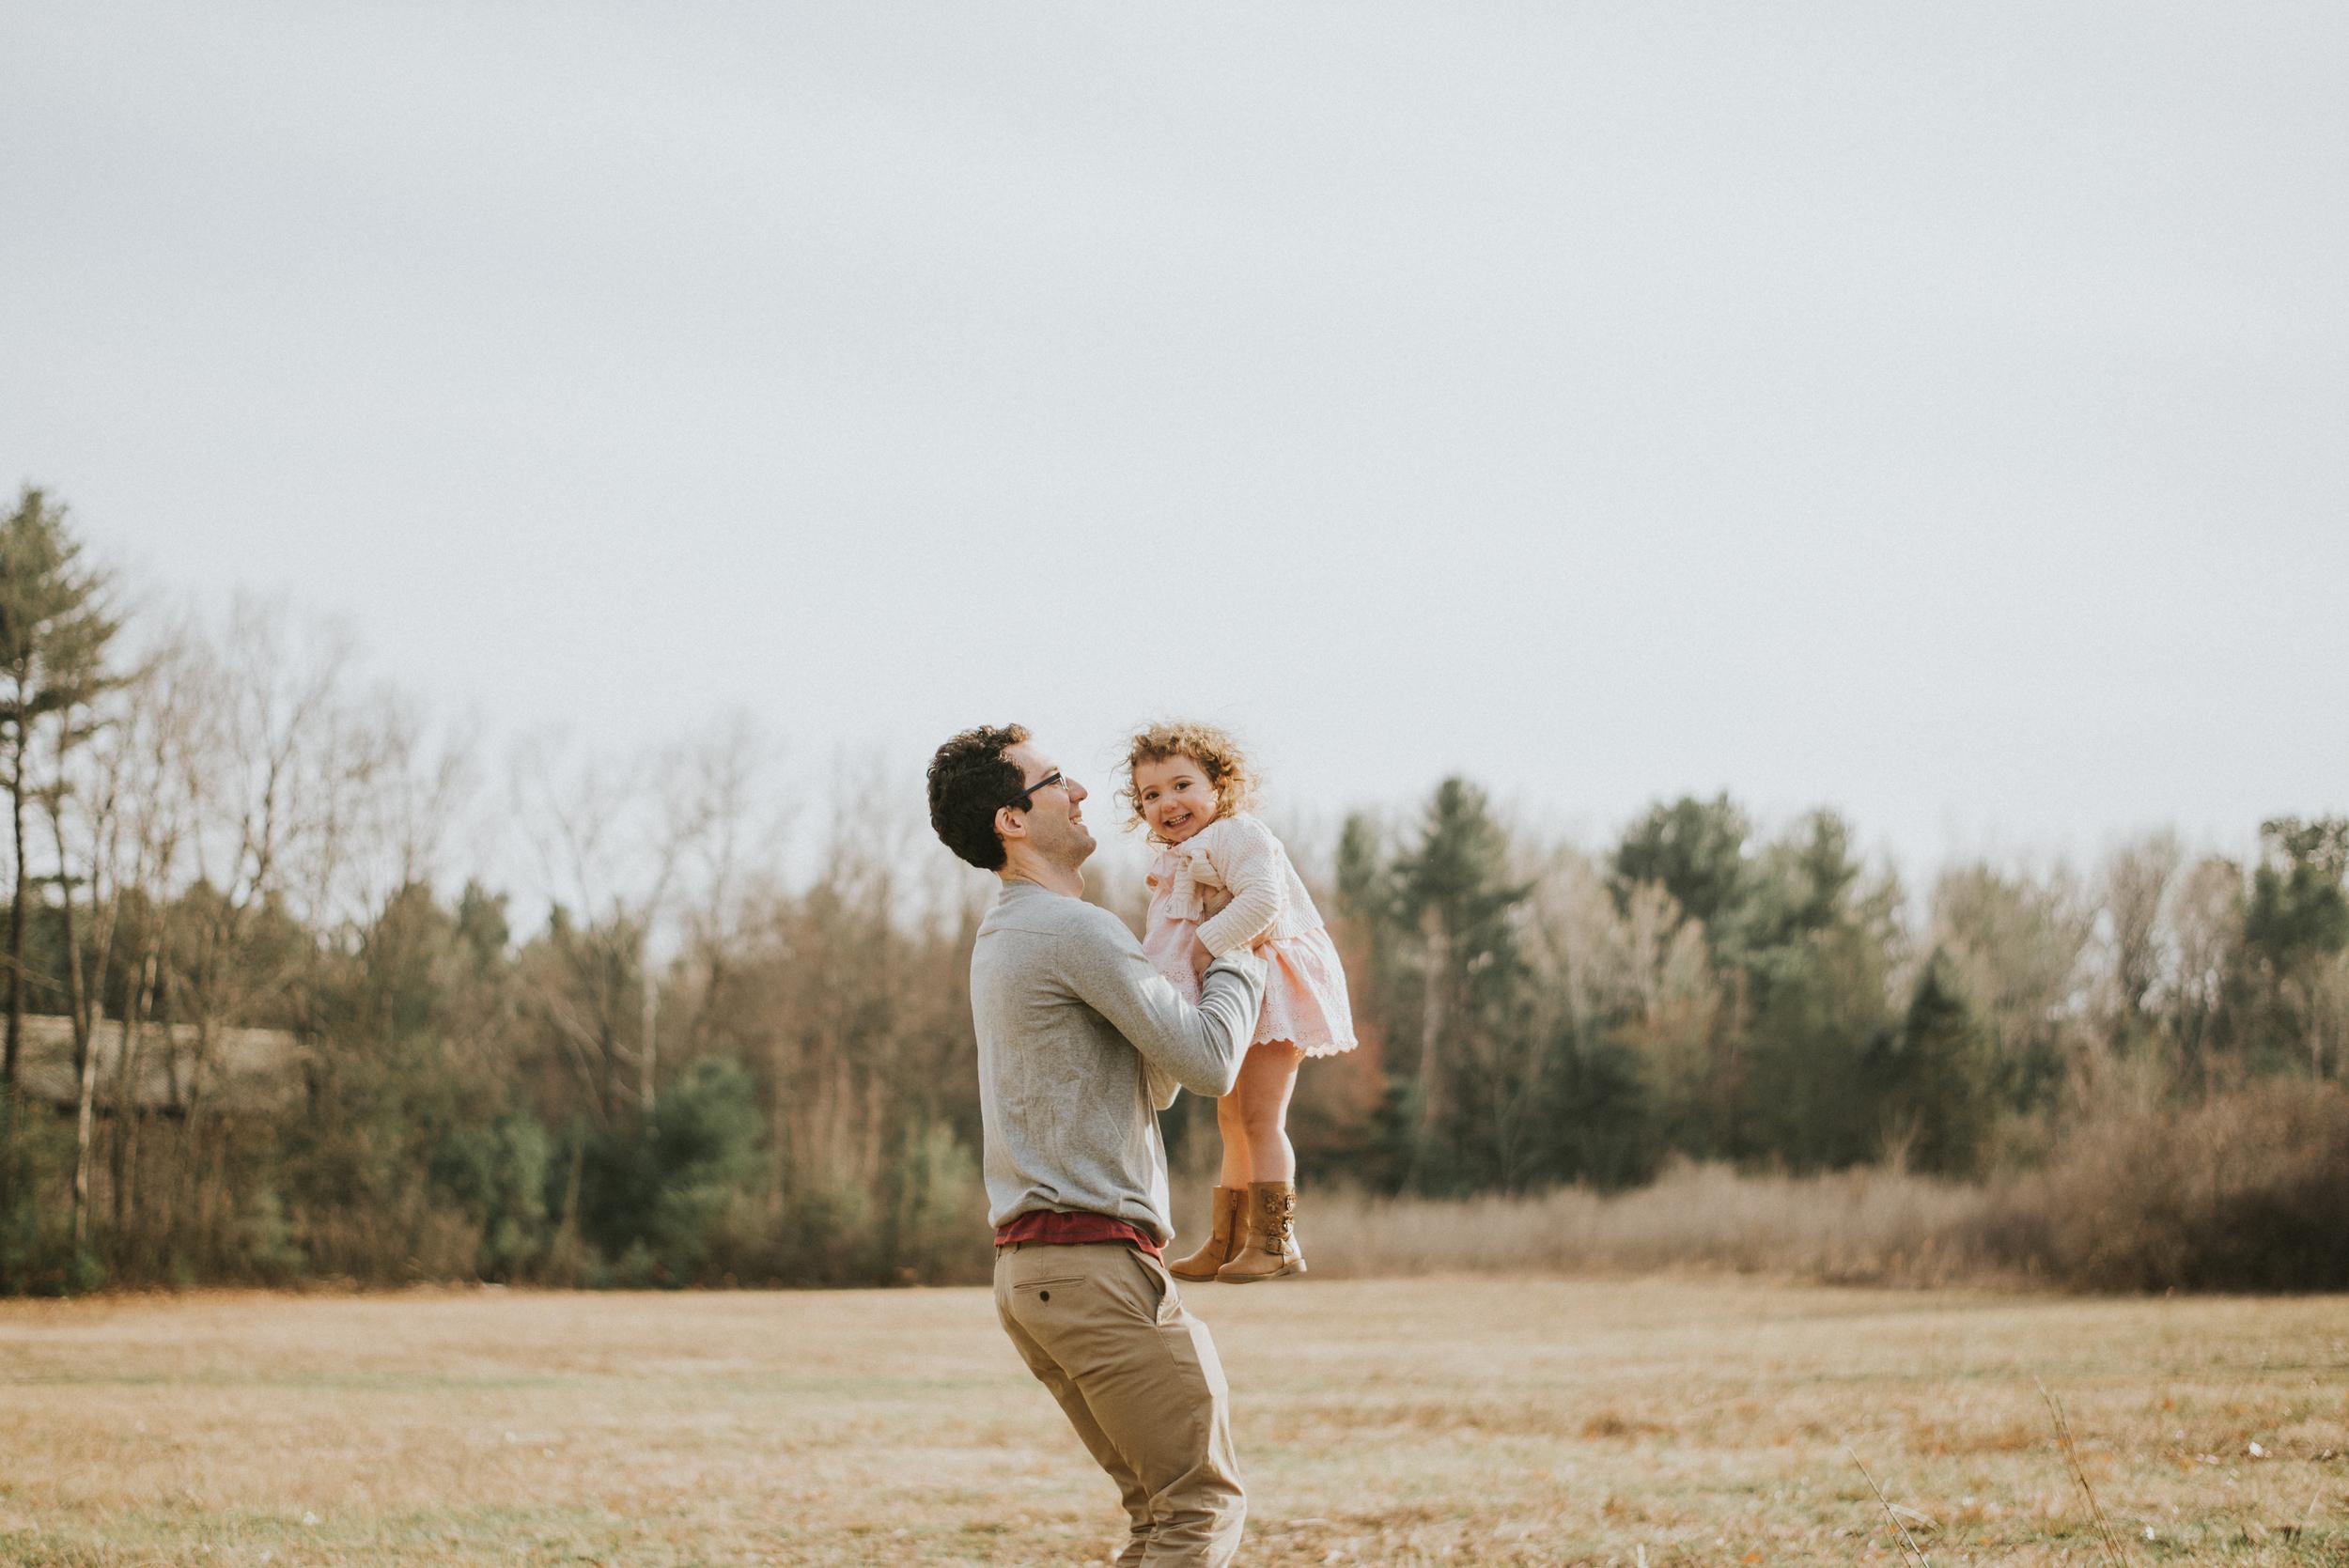 Megan Fuss Photography Maternity Family Session 00017.jpg